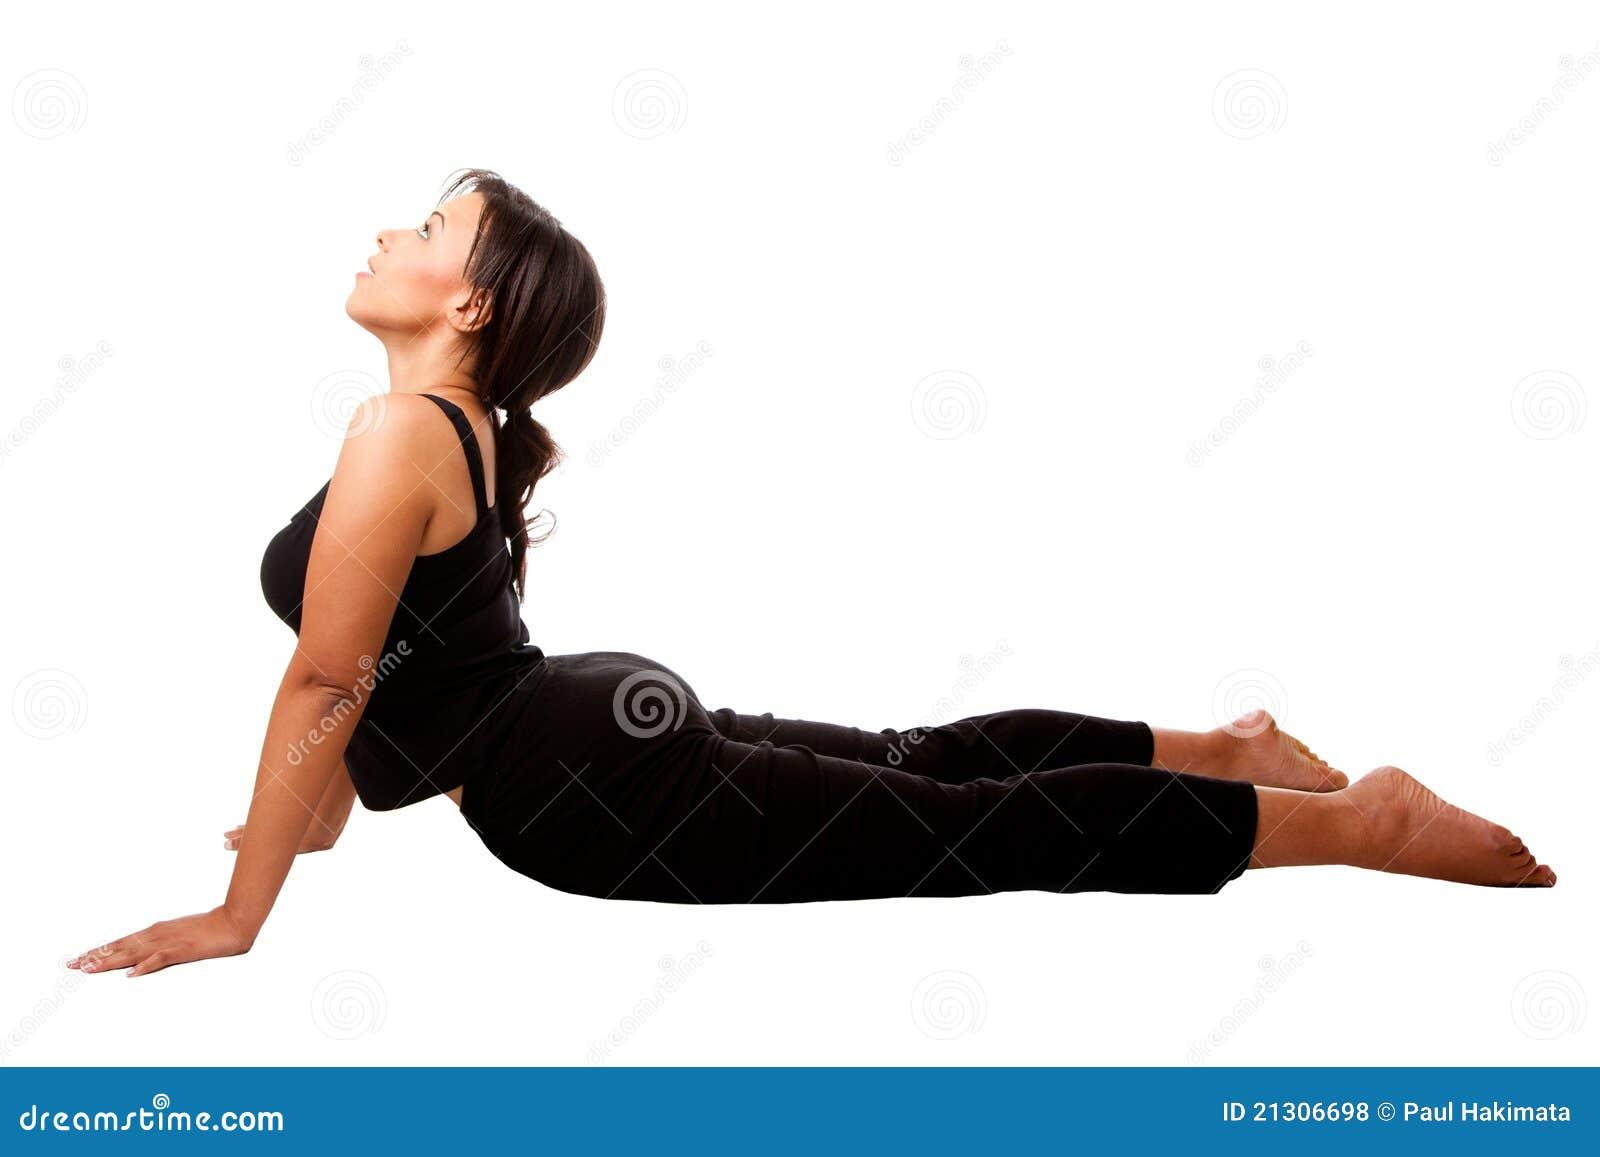 Cobra Position Yoga Excercise Royalty Free Stock Photos ...